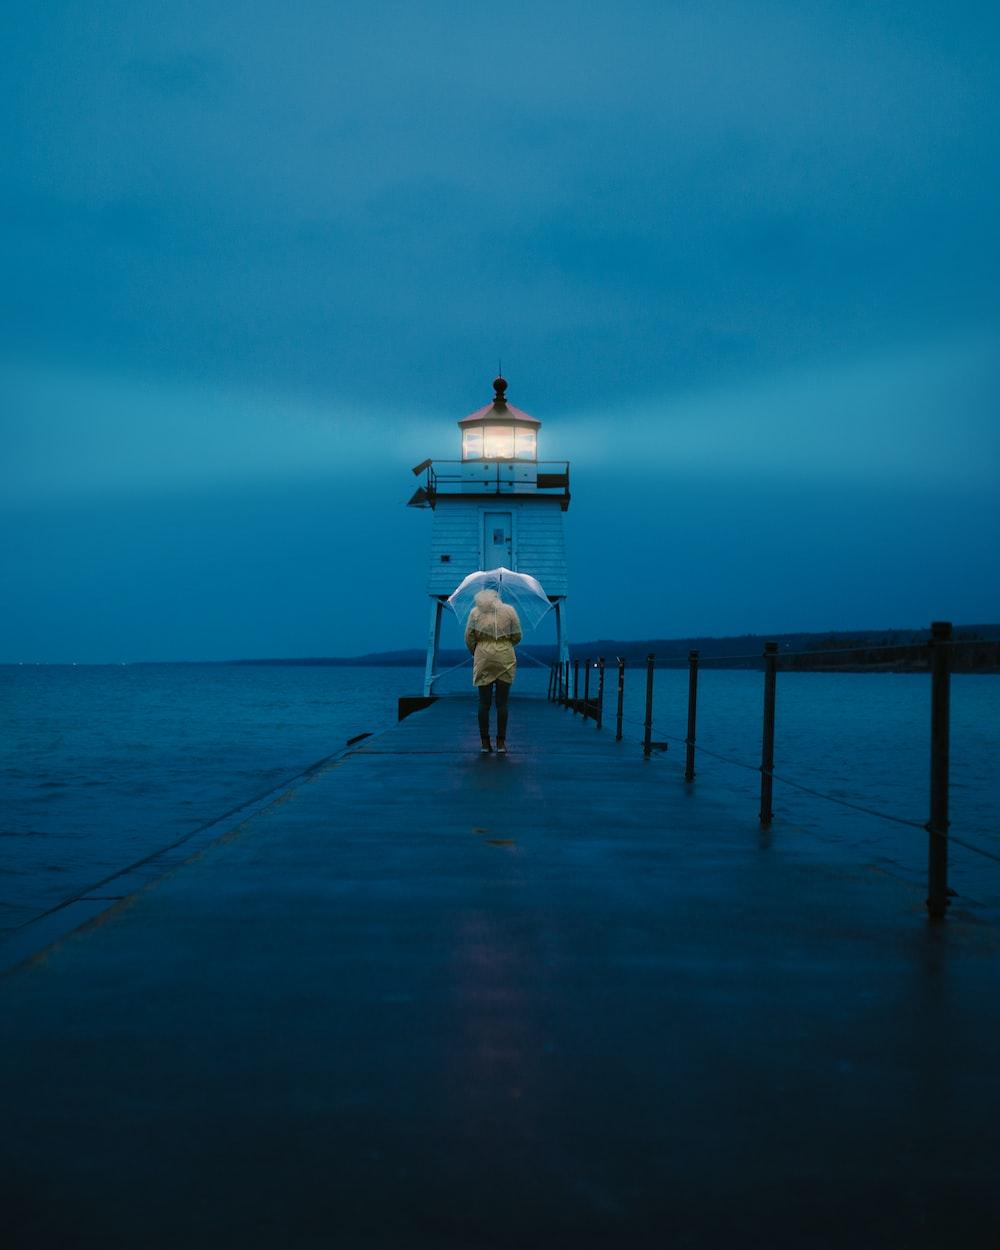 person walking on dock